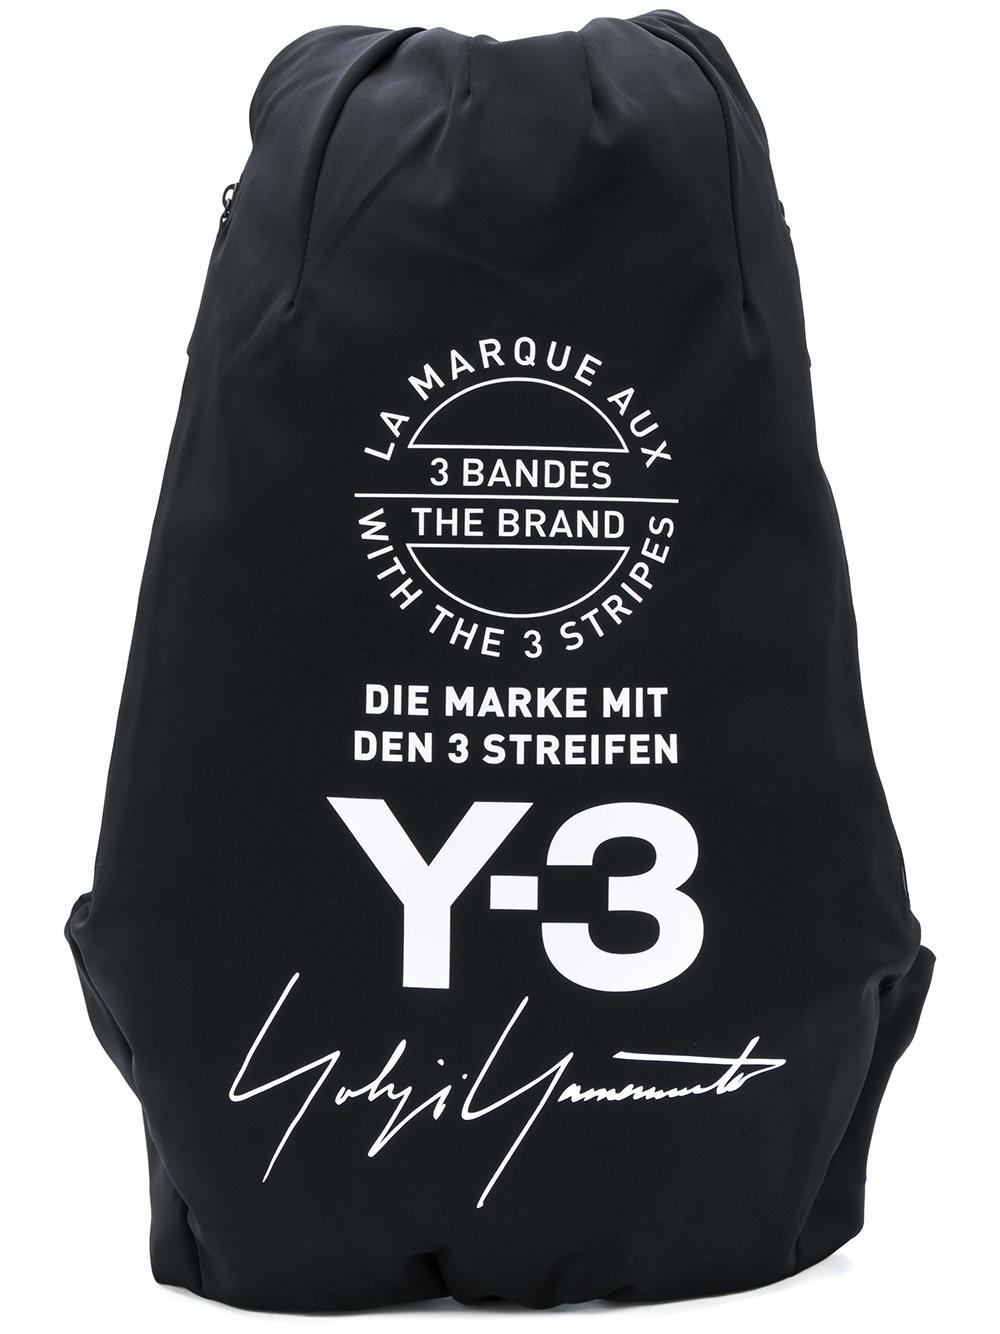 Y-3 Branded Backpack in Black for Men - Lyst c9c11462cfa96